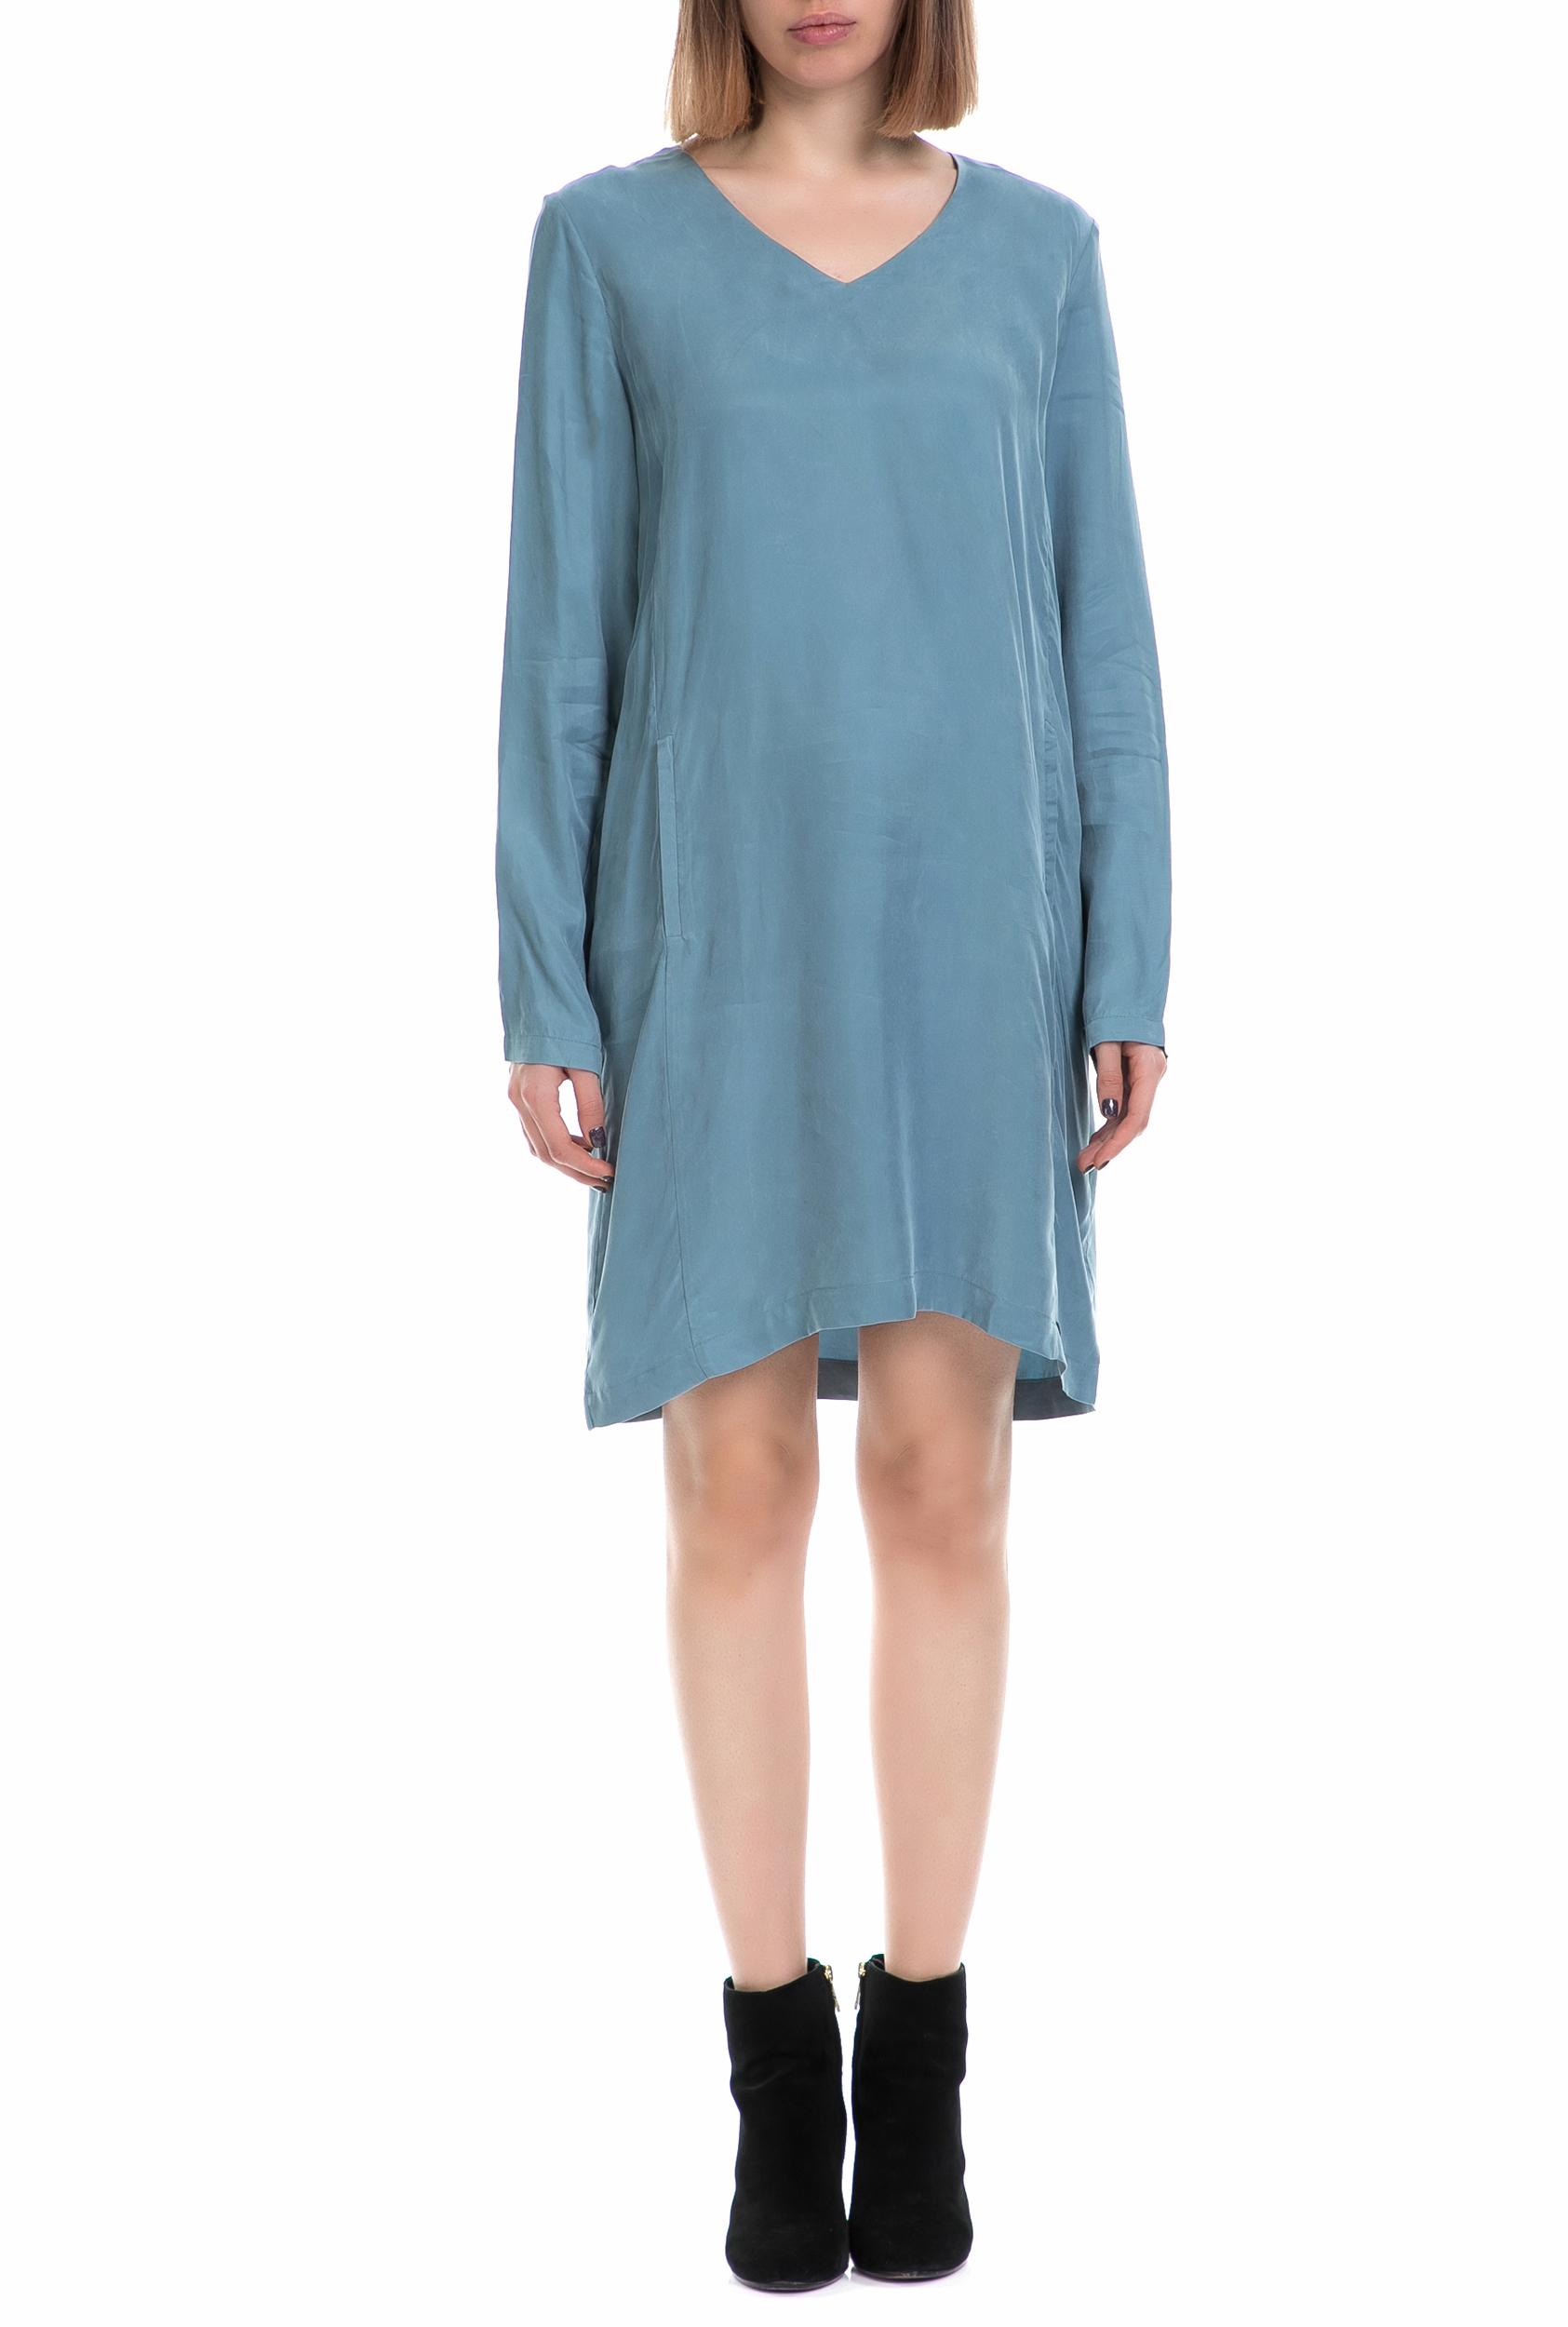 NUMPH - Γυναικείο φόρεμα NUMPH μπλε γυναικεία ρούχα φόρεματα μίνι